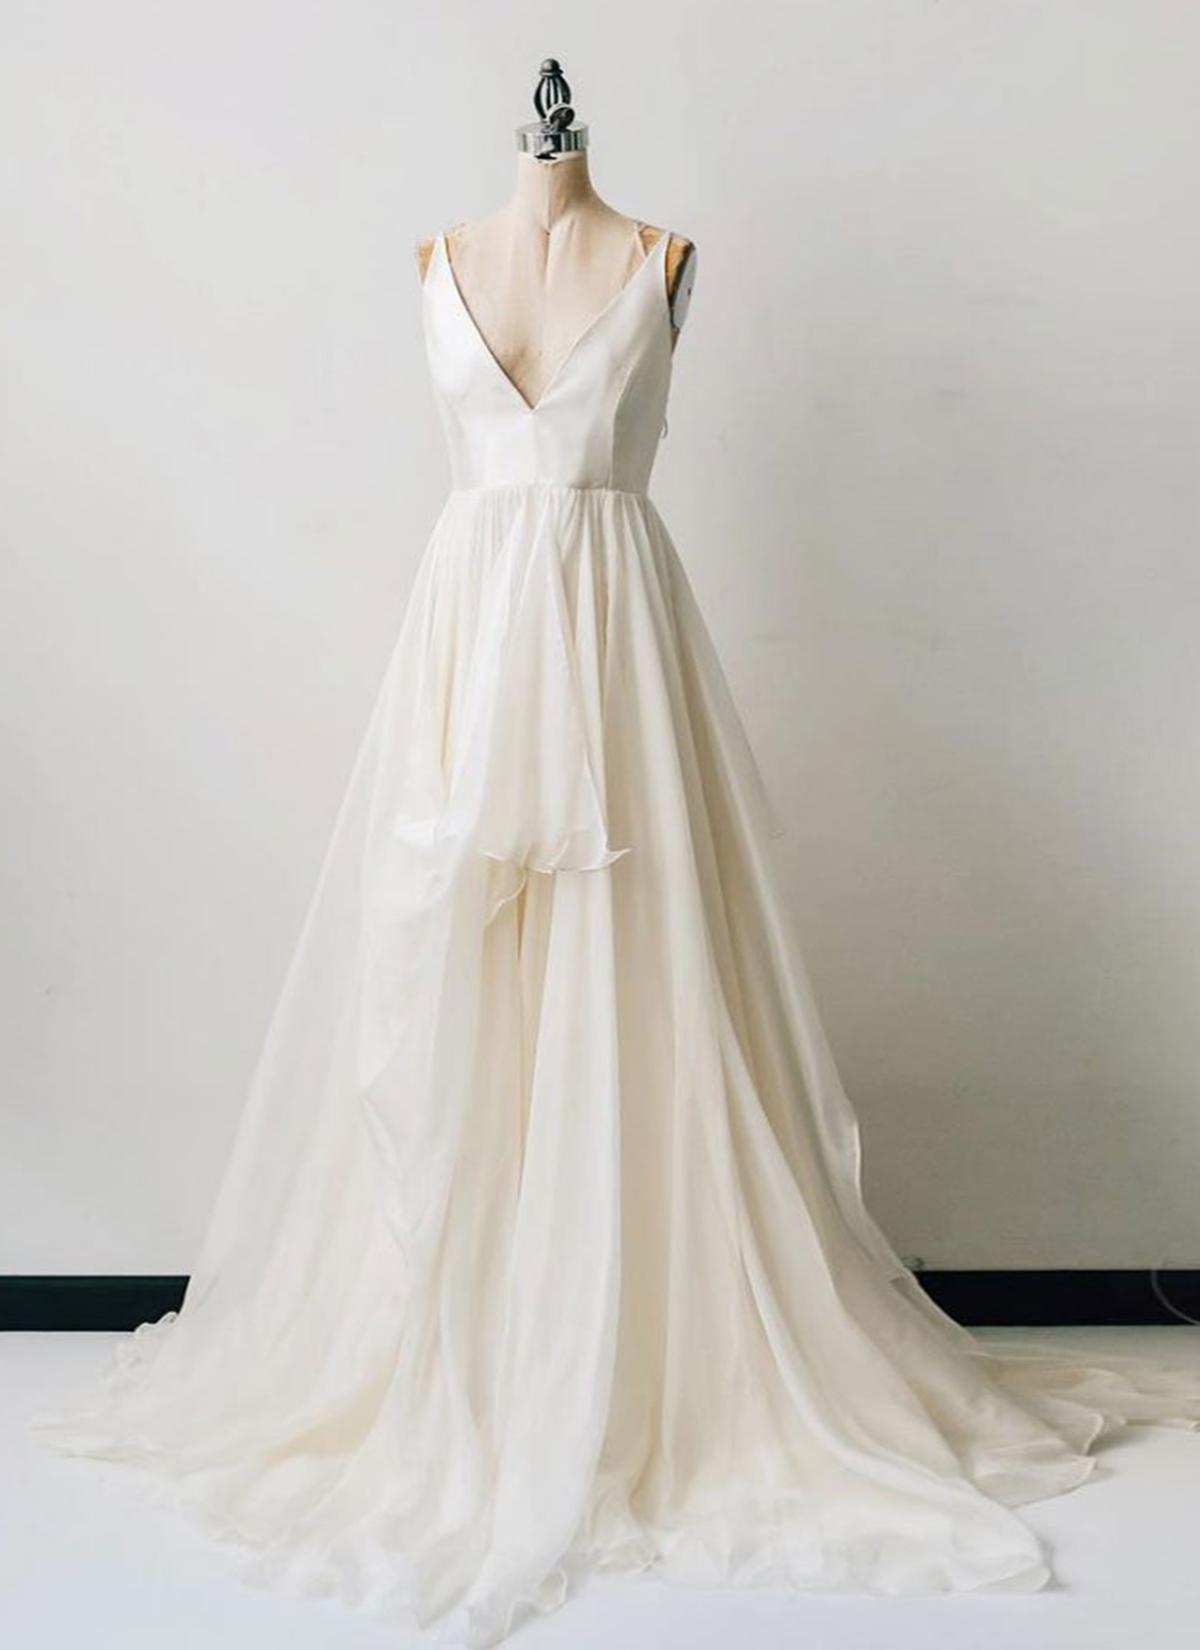 644c9adce025 Spring white chiffon v neck long prom dress, white ruffles formal dress